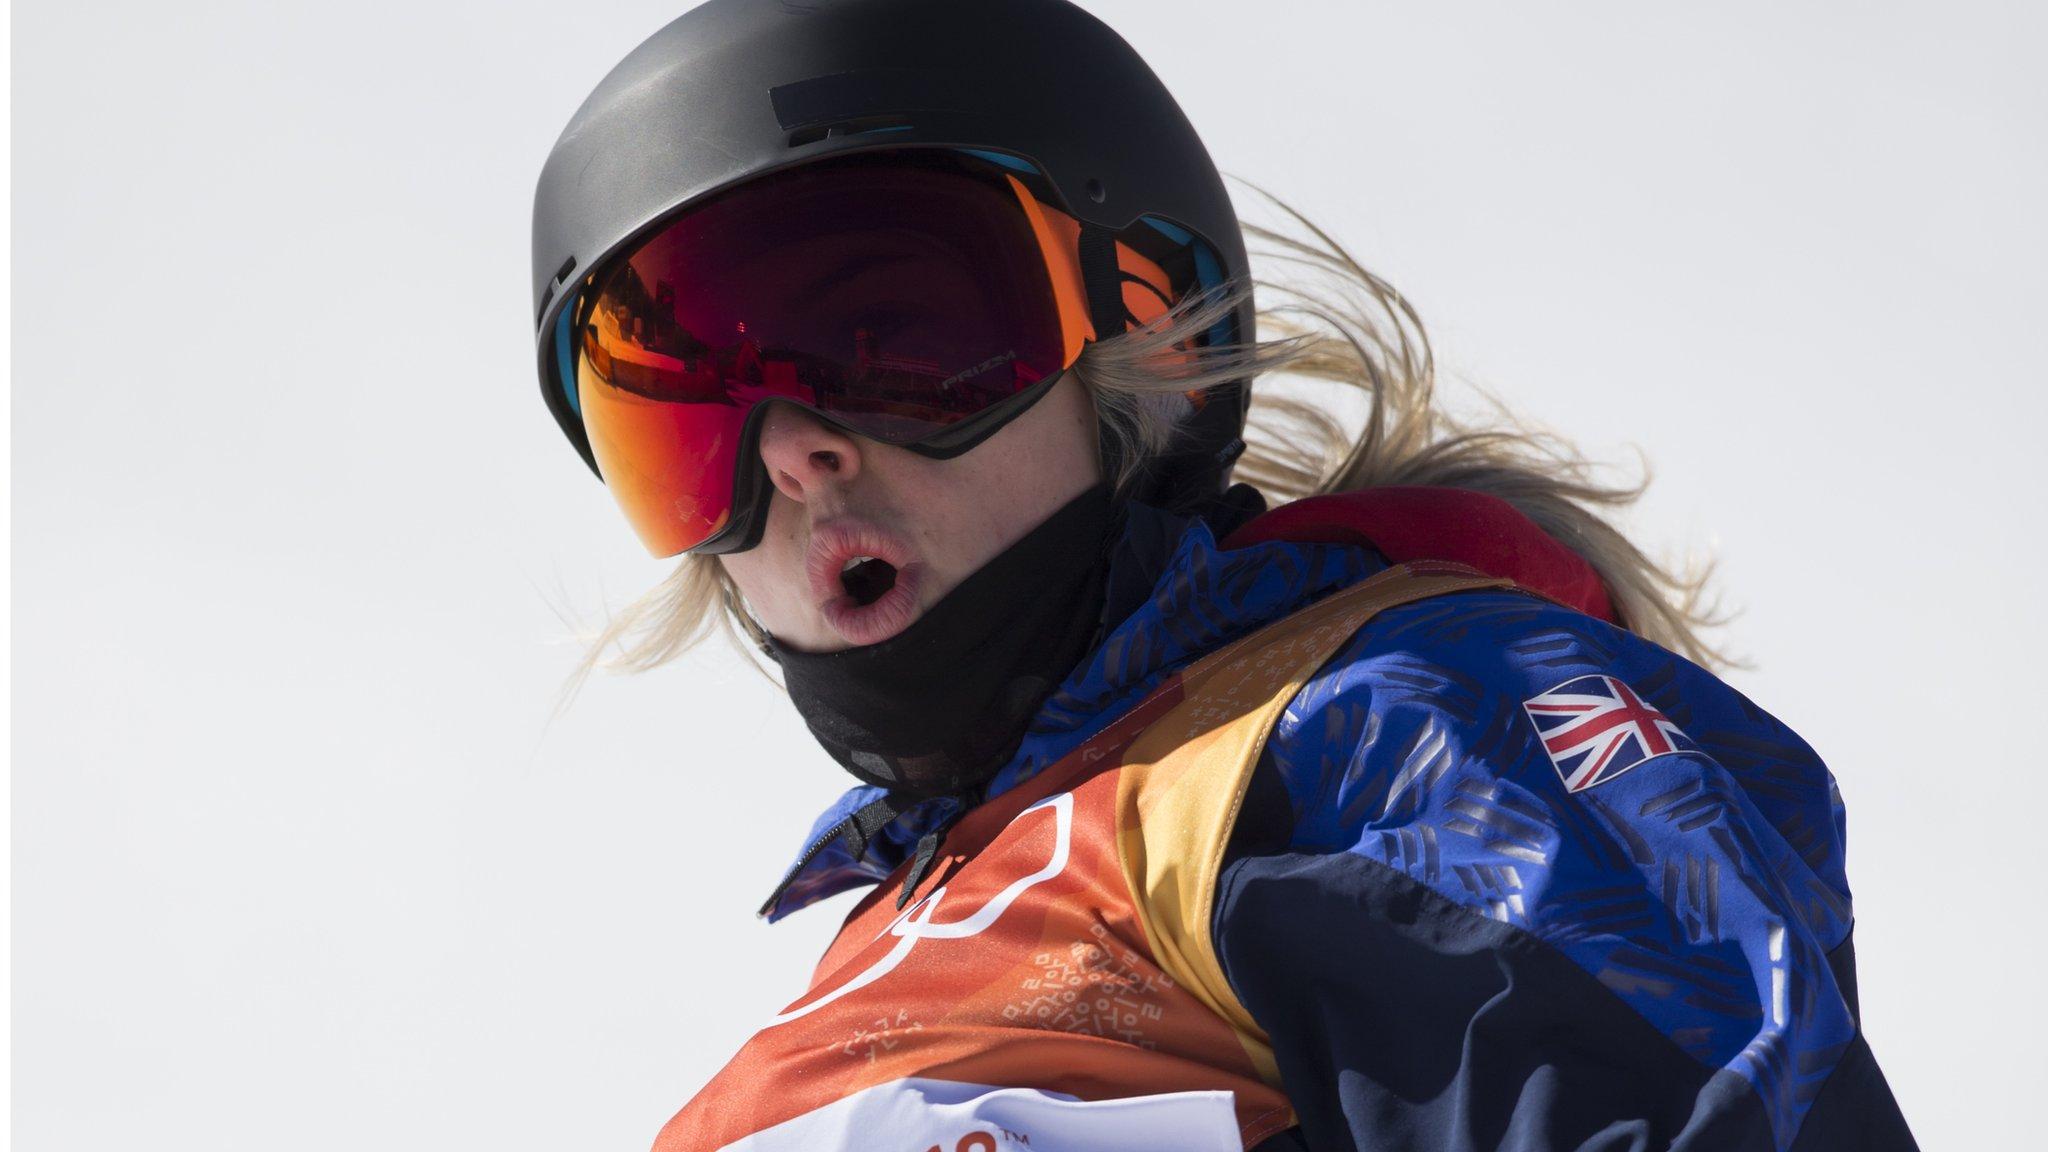 Katie Summerhayes: British freestyle skier ruptures knee ligament for third time